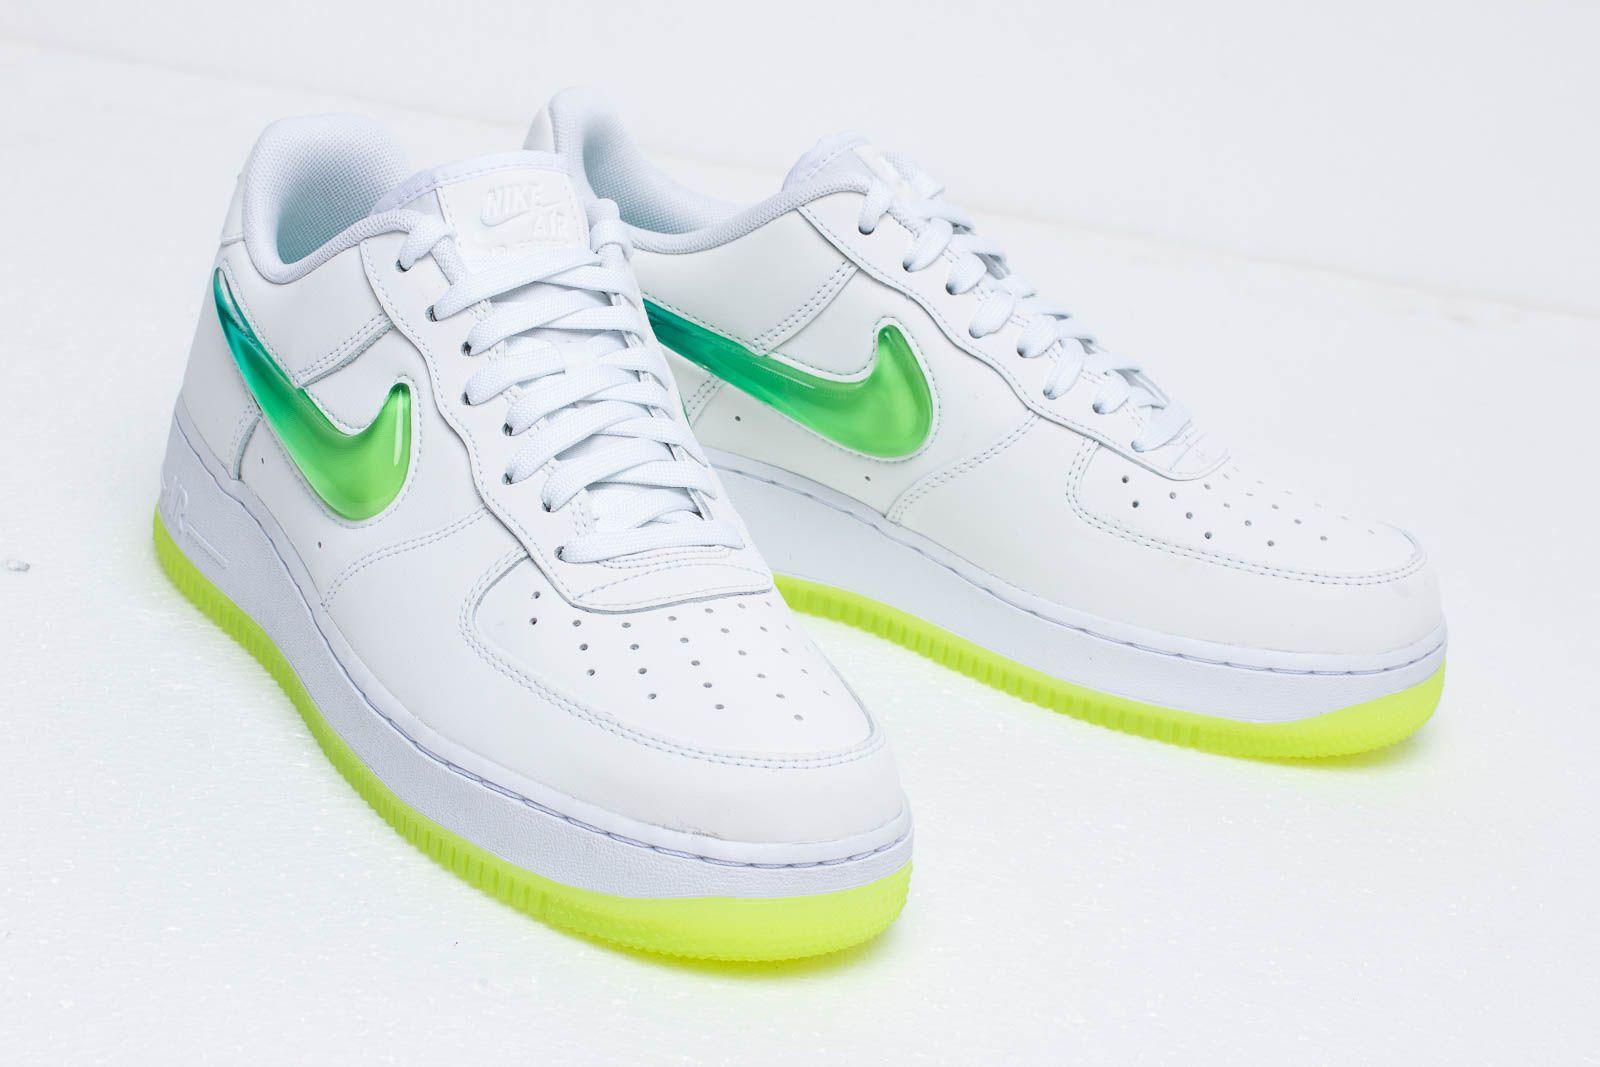 Nike Air Force 1 '07 Prm 2 White Volt Hyper Jade | Footshop